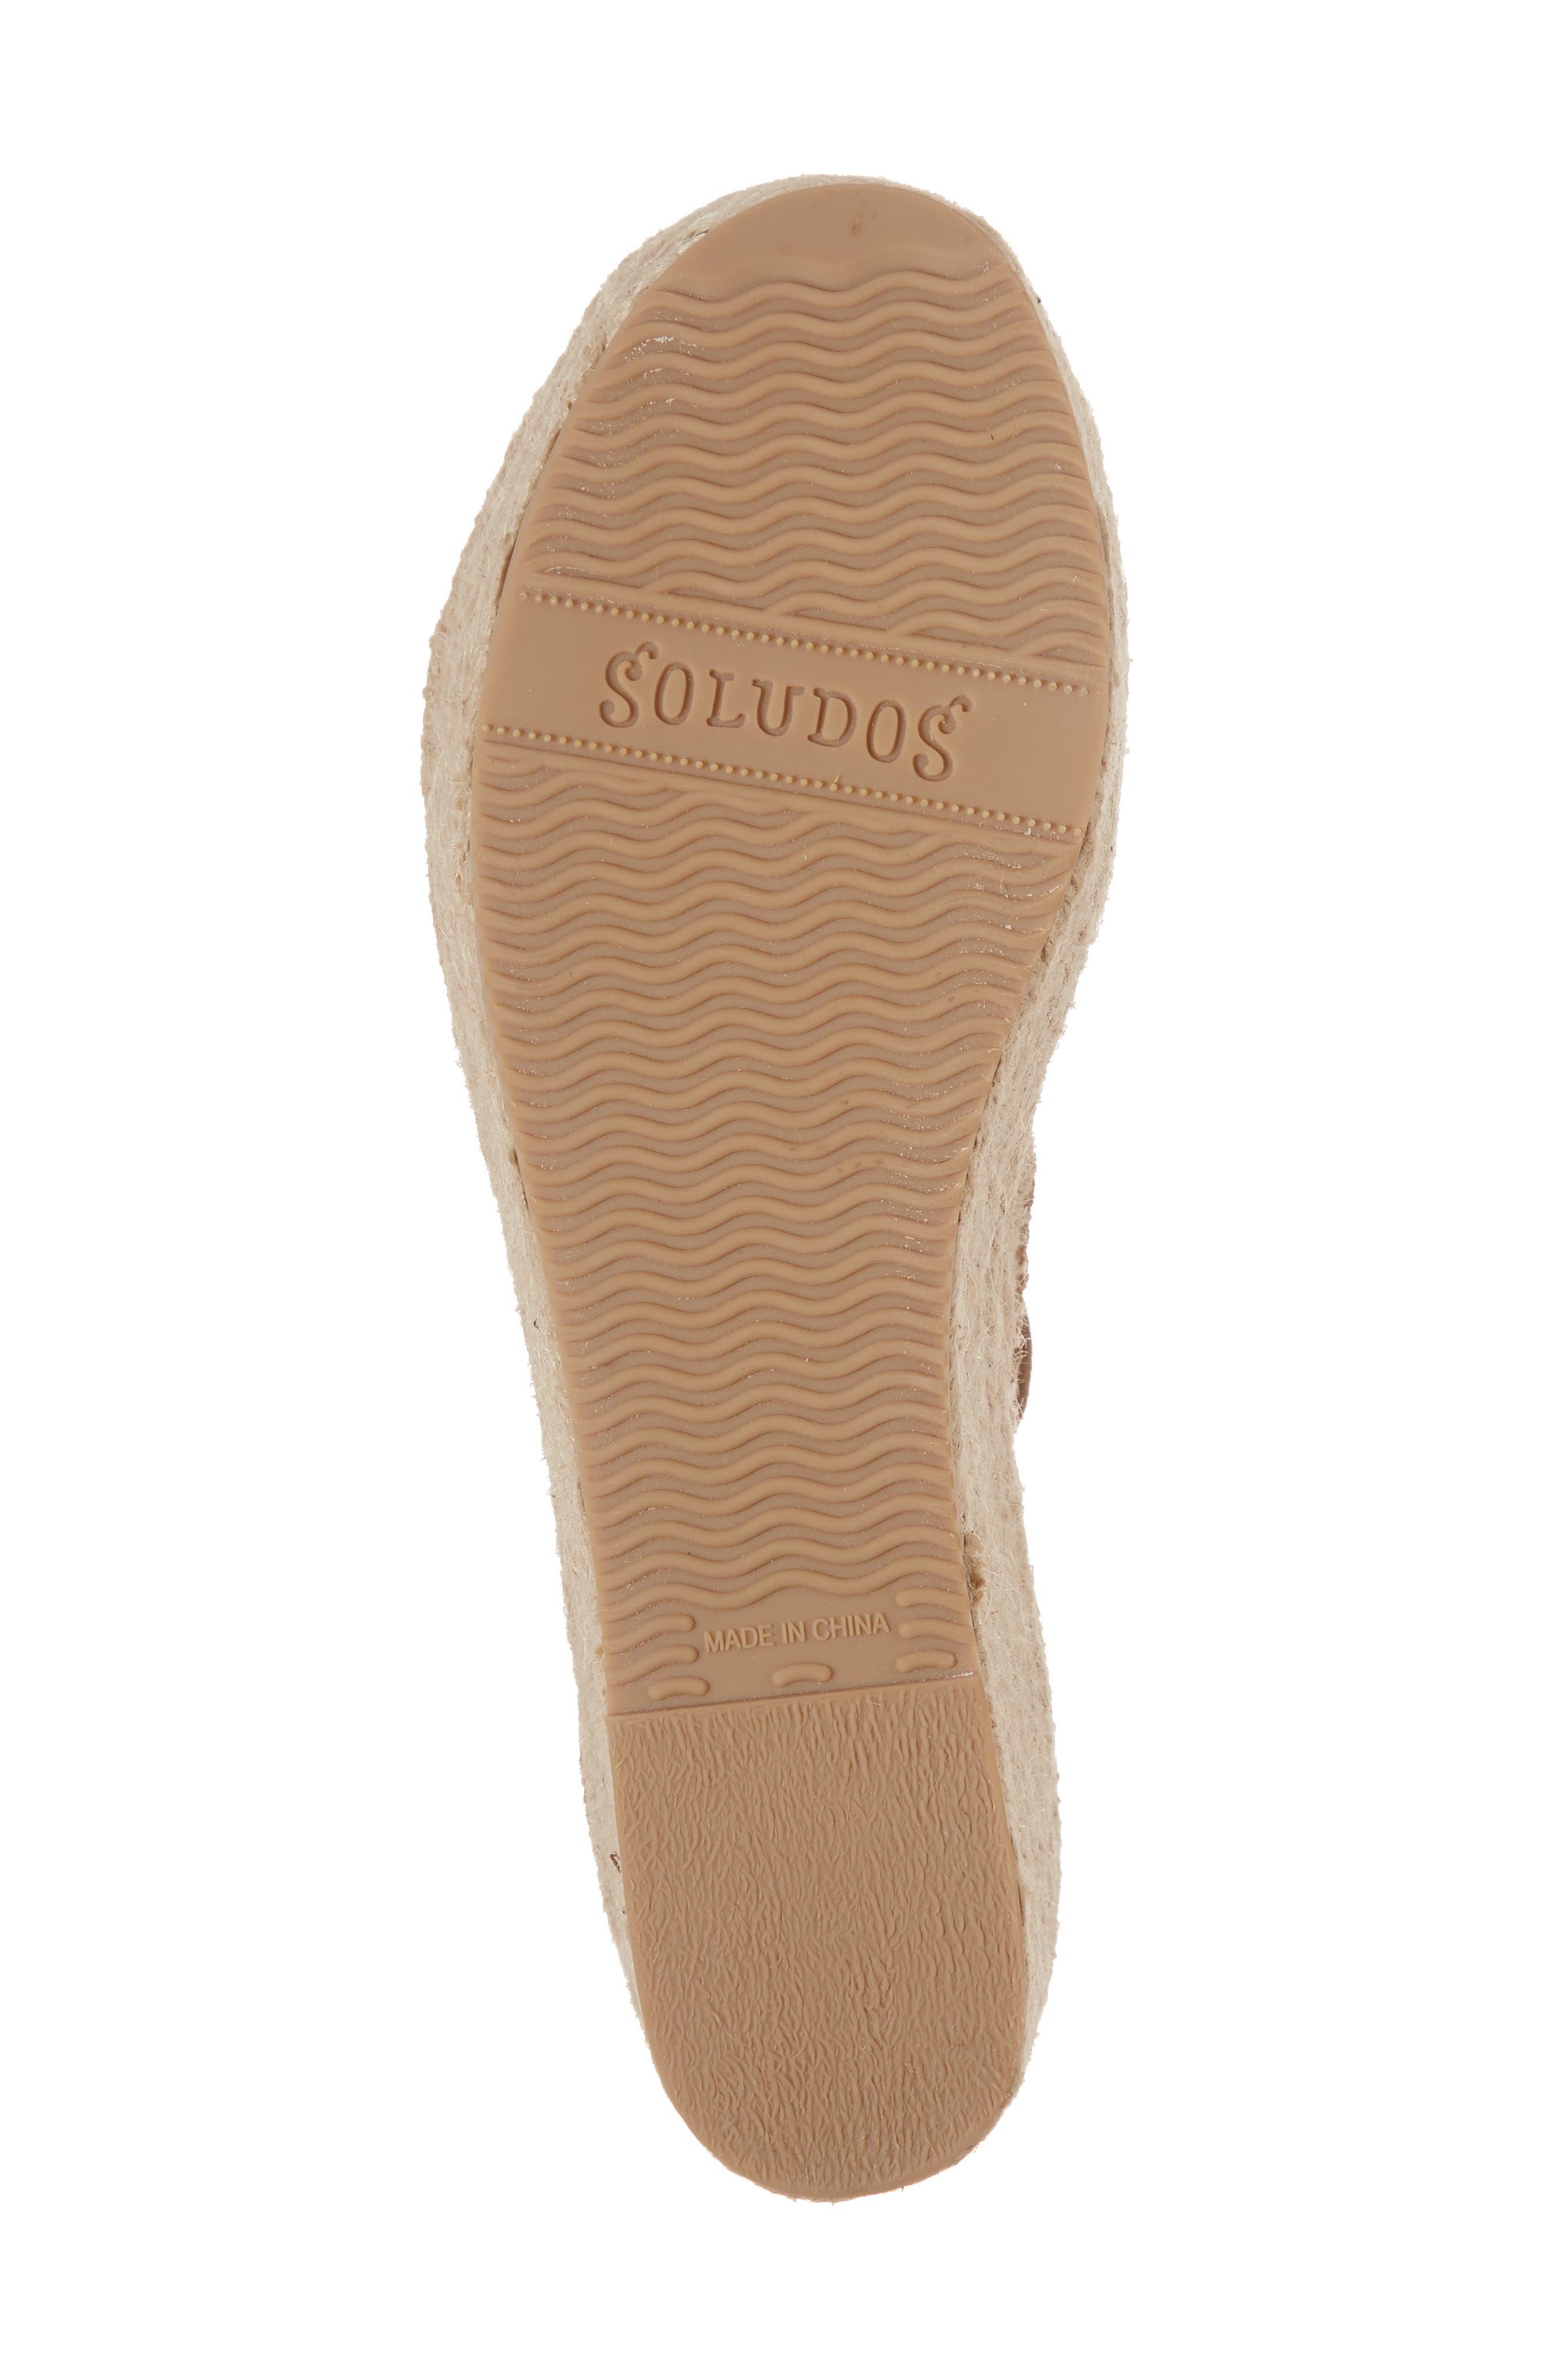 SOLUDOS, Palma Platform Espadrille Sandal, Alternate thumbnail 6, color, WALNUT SUEDE